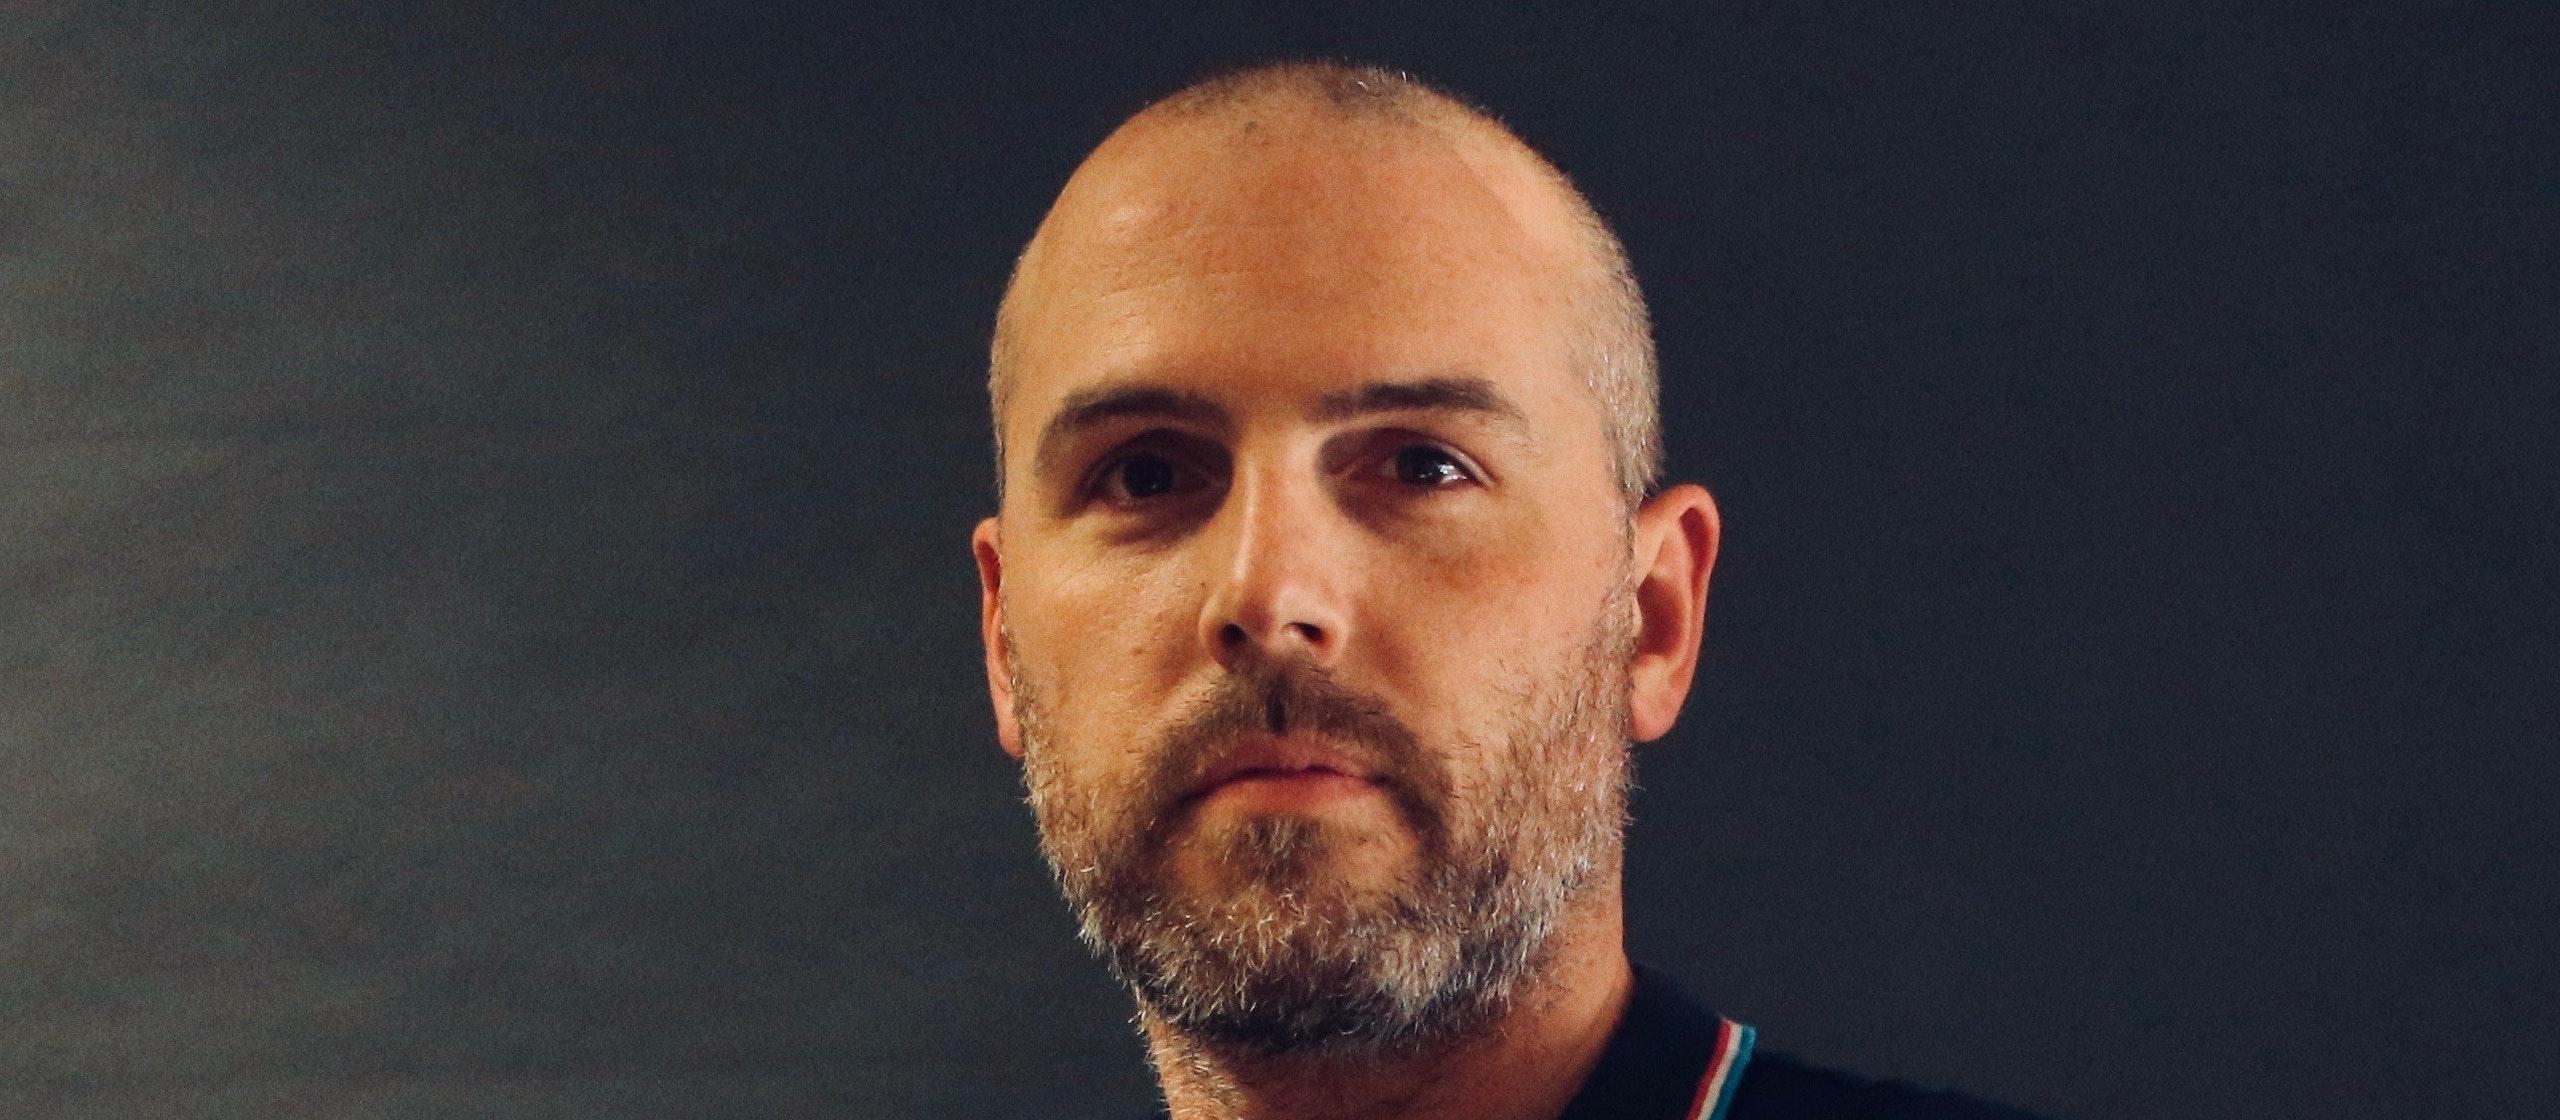 Webdna Technical Director Samuel Birch